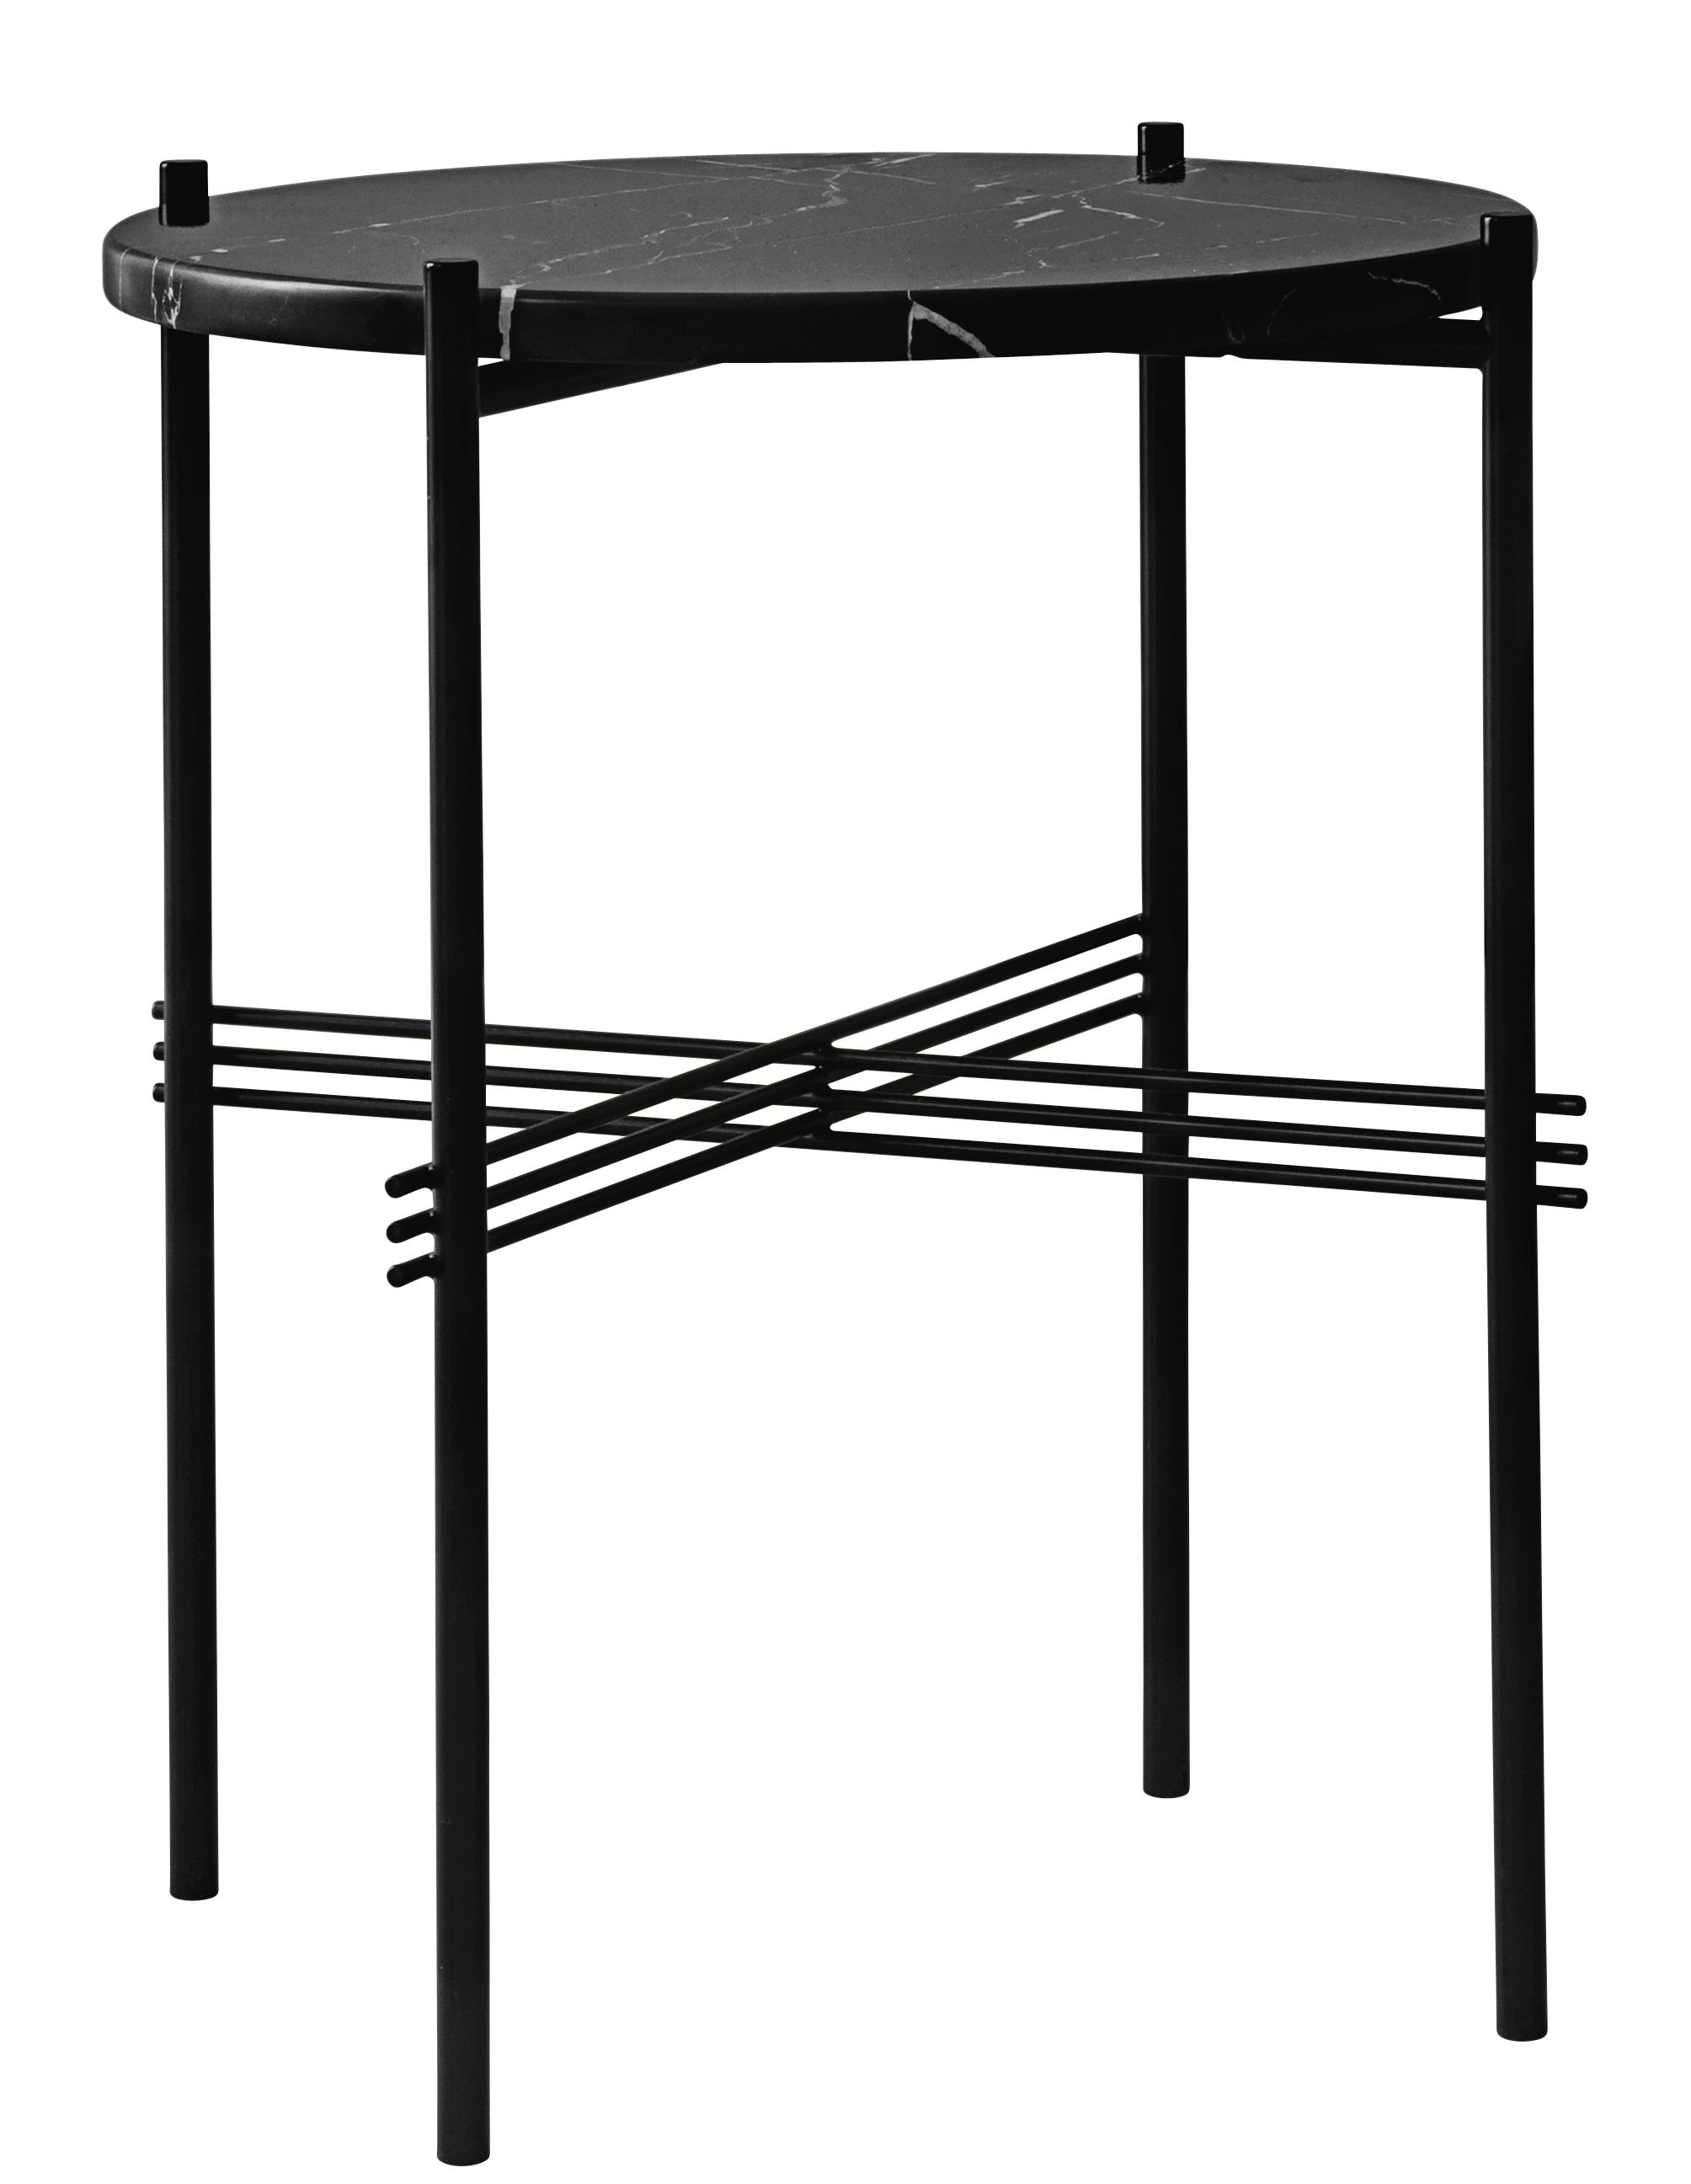 Ts Coffee Table 216 40 Cm H 51 Cm Marble Black Top